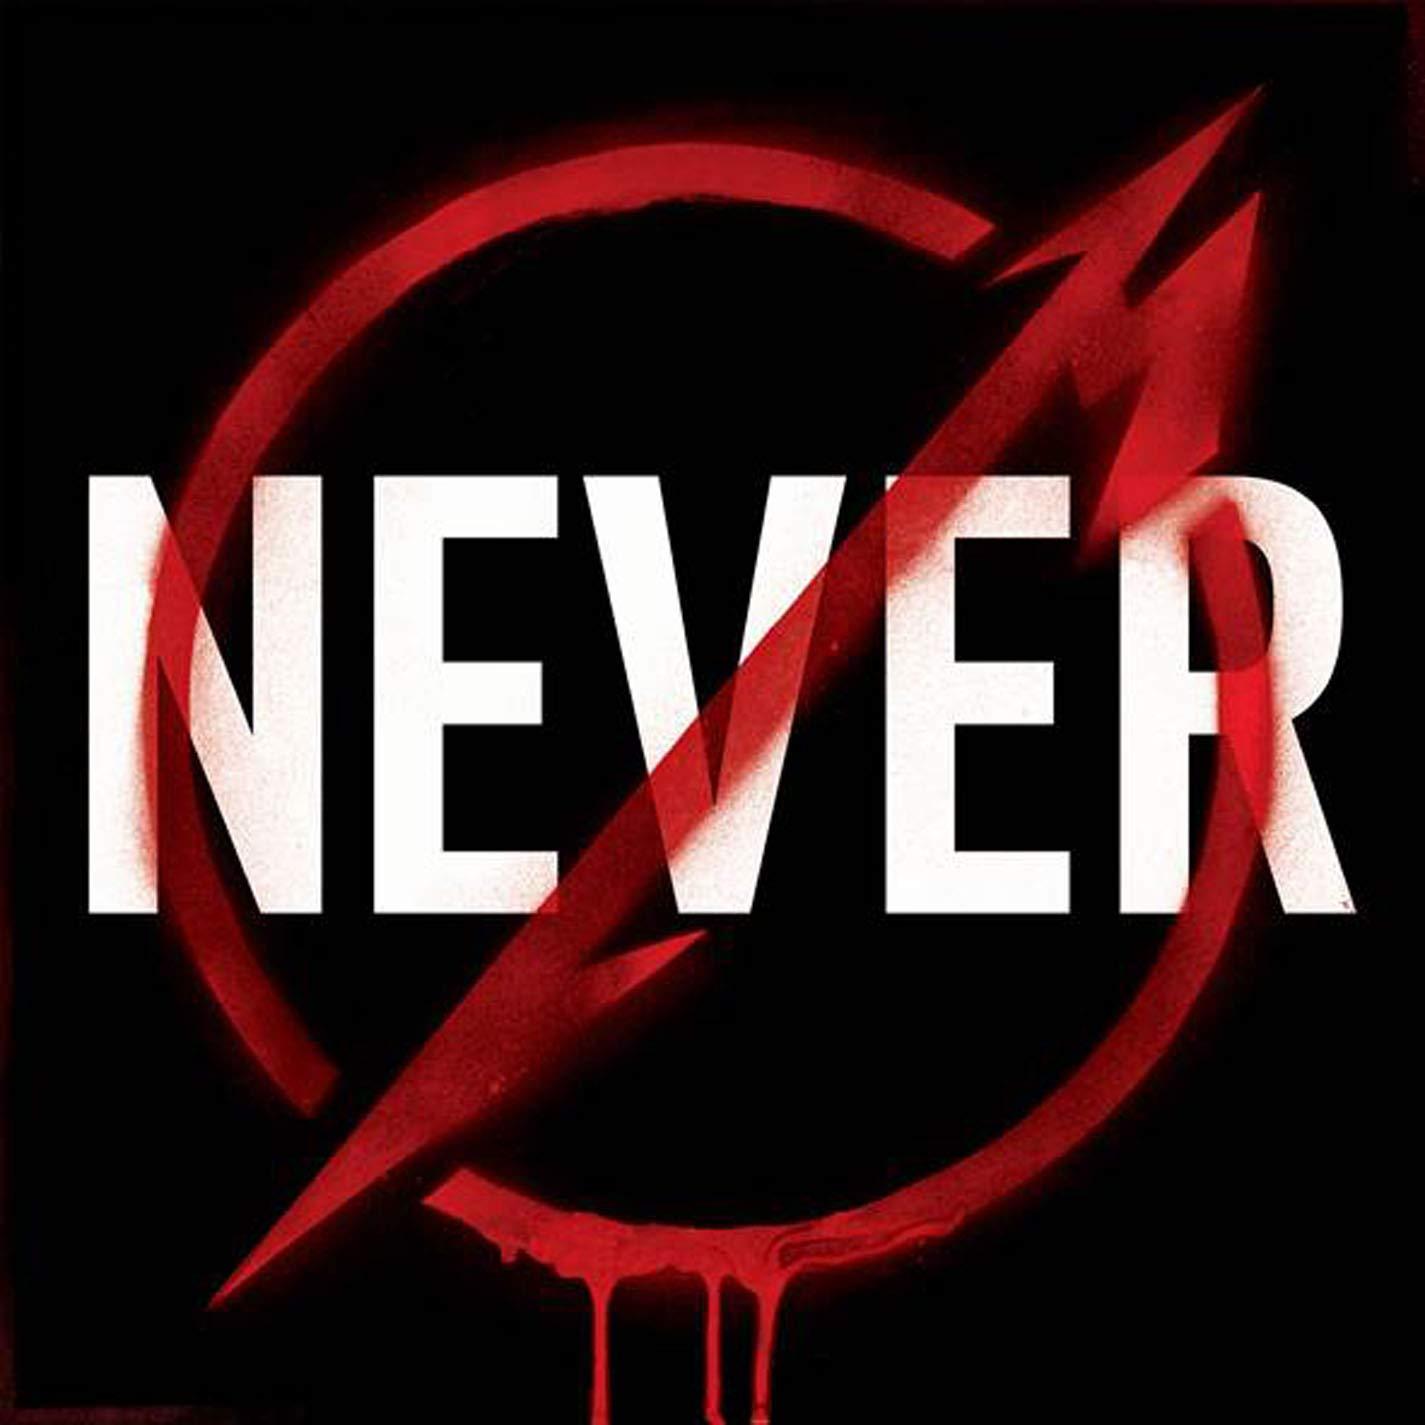 Metallica Metallica Through The Never 33 Rpm 3lp Black Red